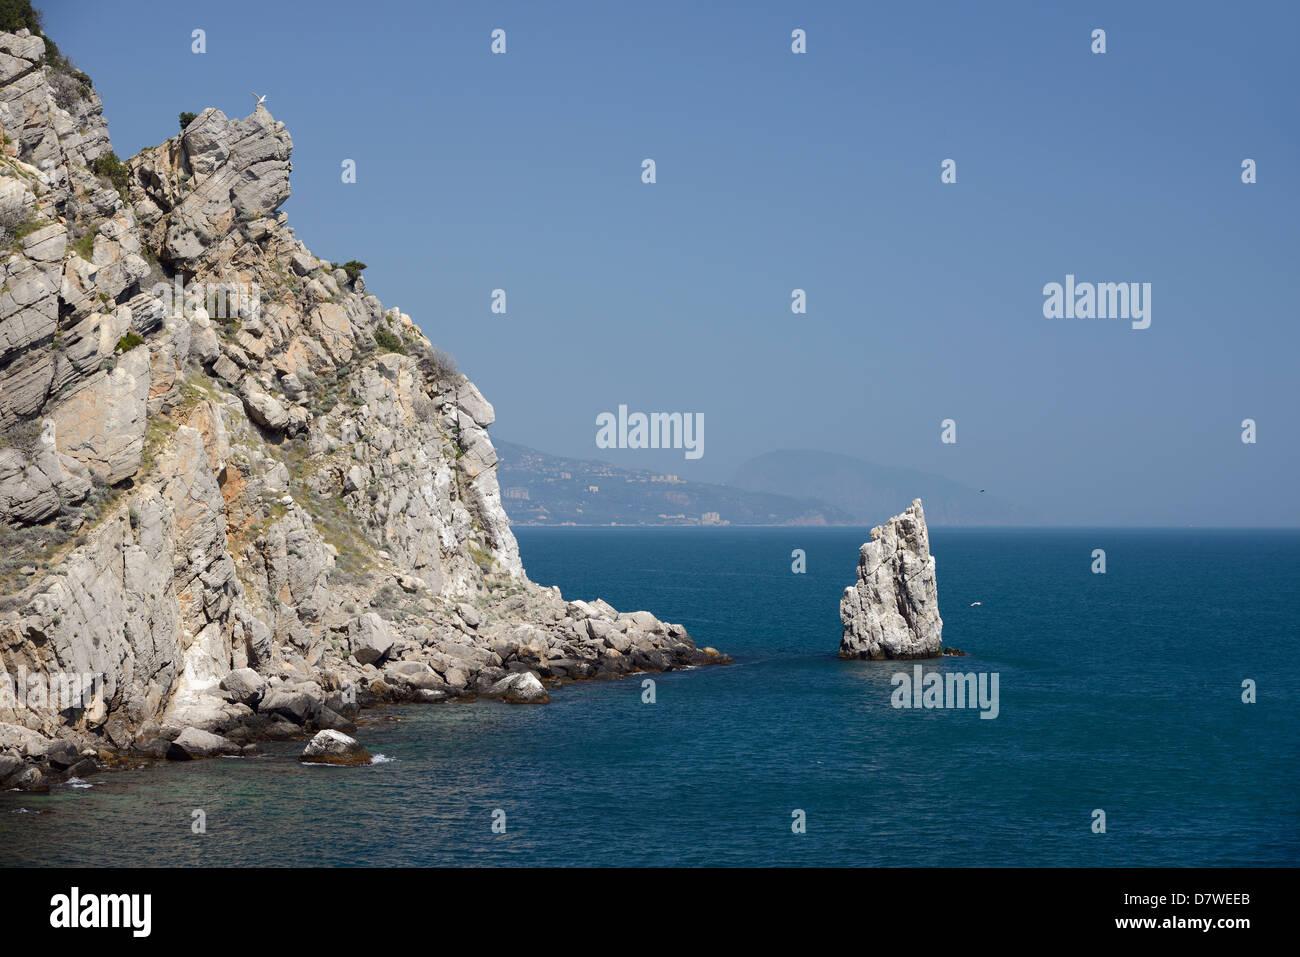 Ai-Todor Cape, near Yalta, Crimea, Ukraine - Stock Image